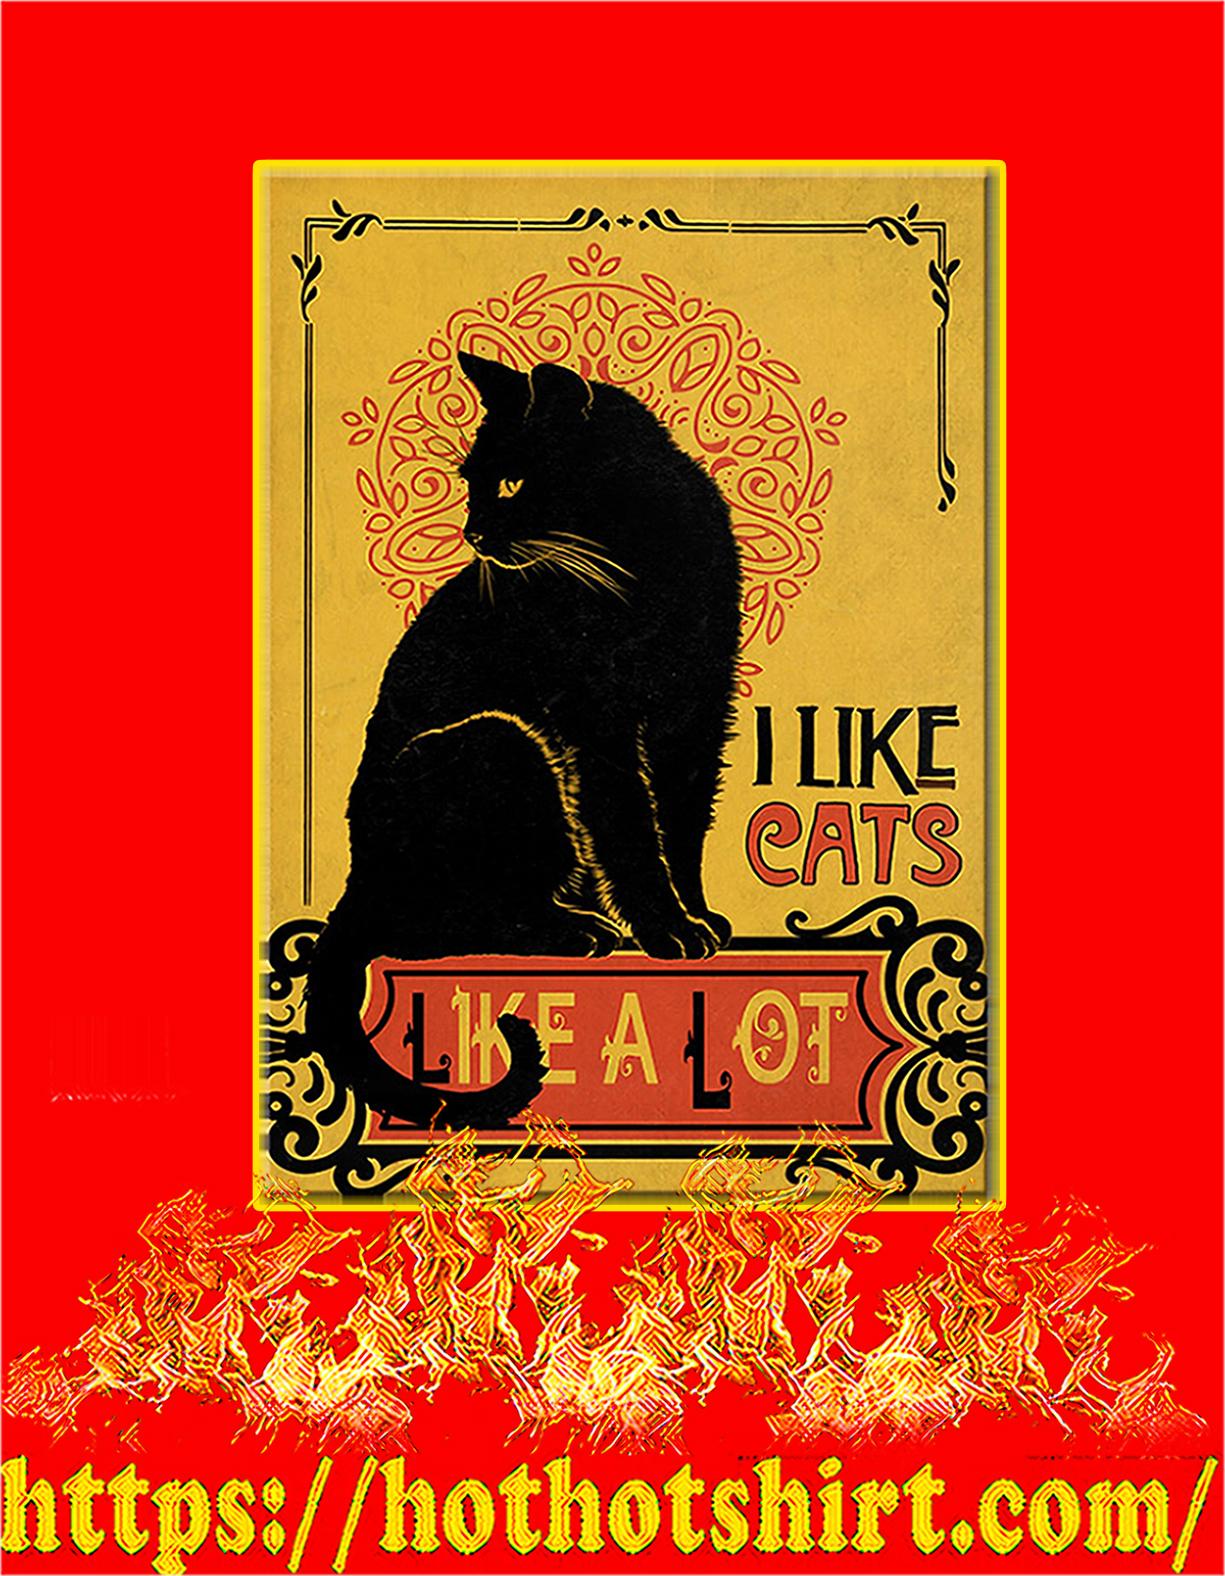 Black cat I like cats like a lot poster - A4